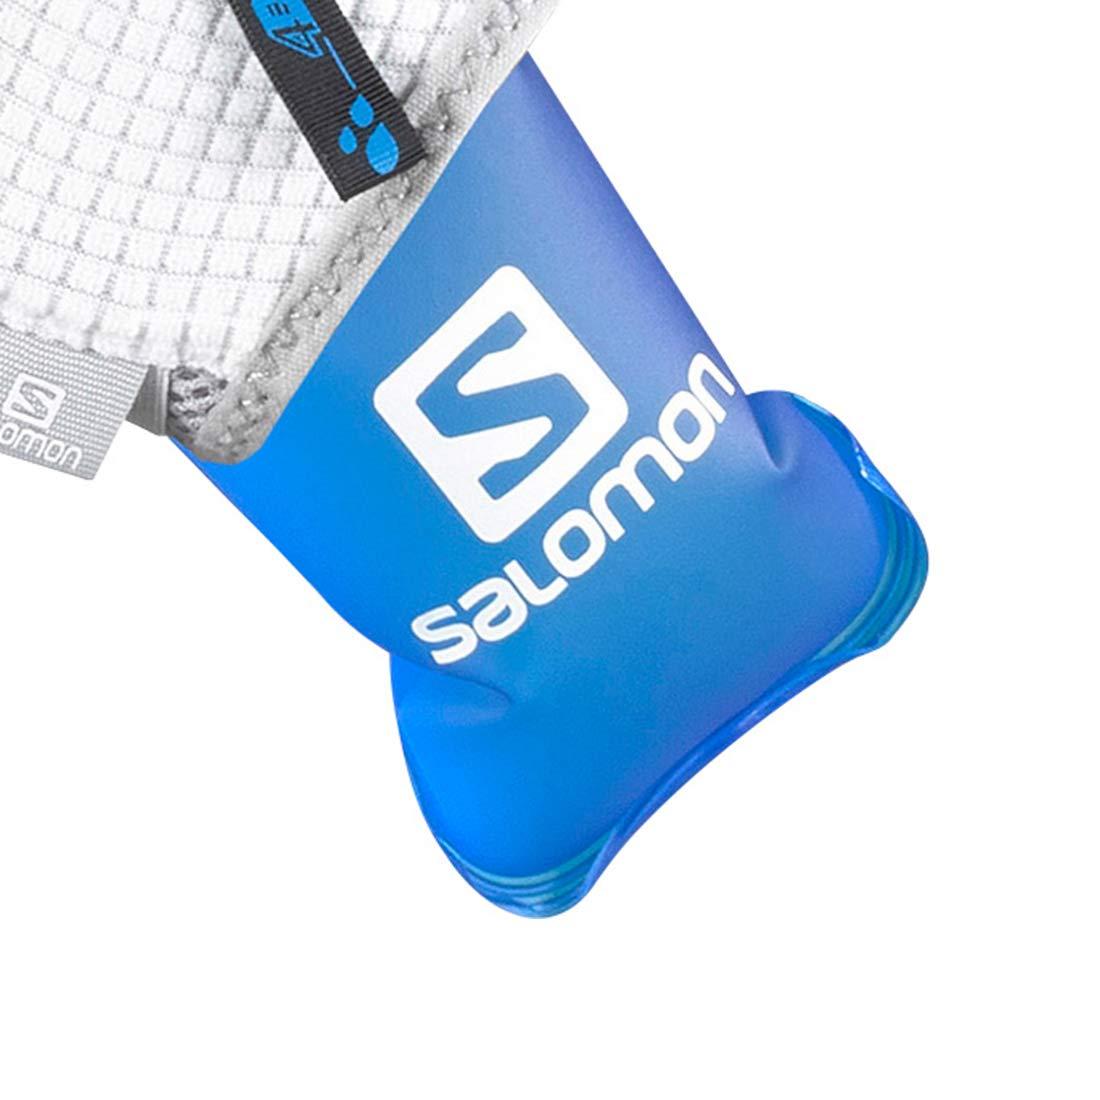 Salomon Sense Sense Sense Hydro Handschuh, Herren B01HNUSW2C | Sehr gute Farbe  43063f